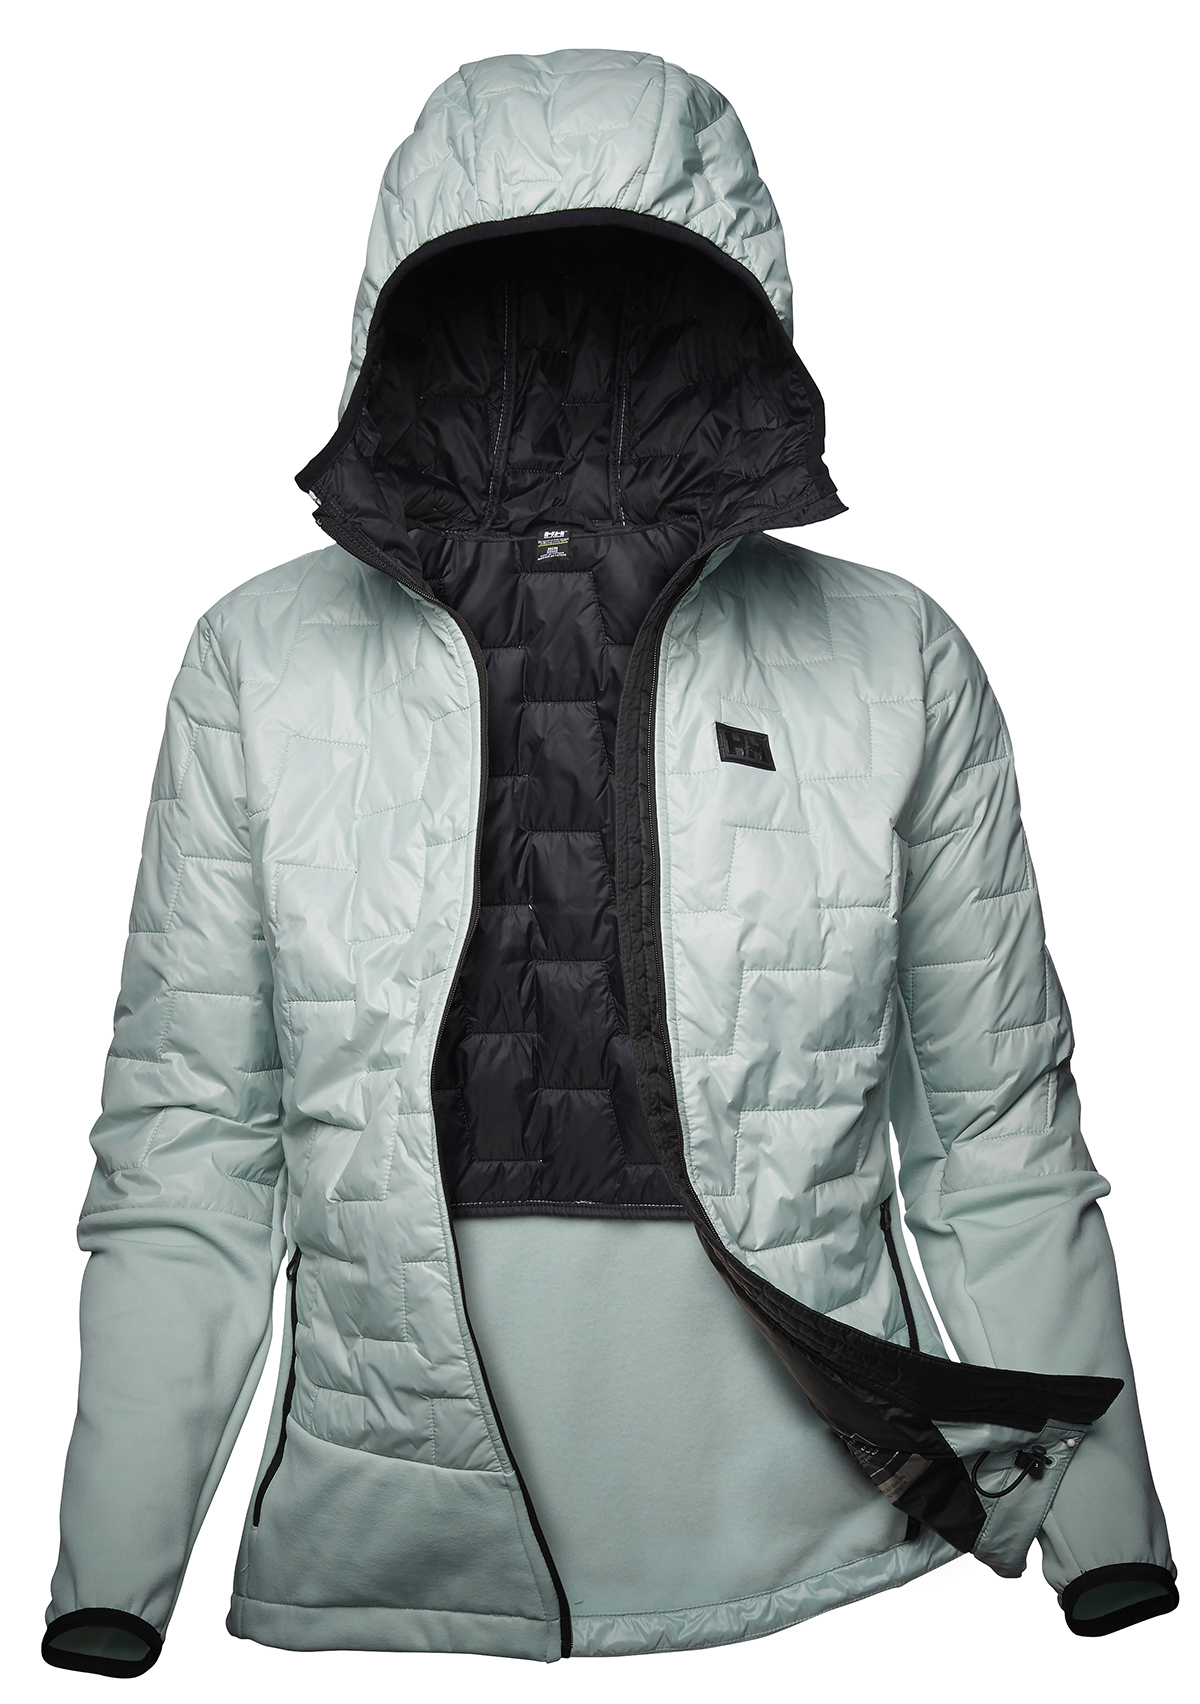 Lifaloft Hybrid Insulator Jacket HERO